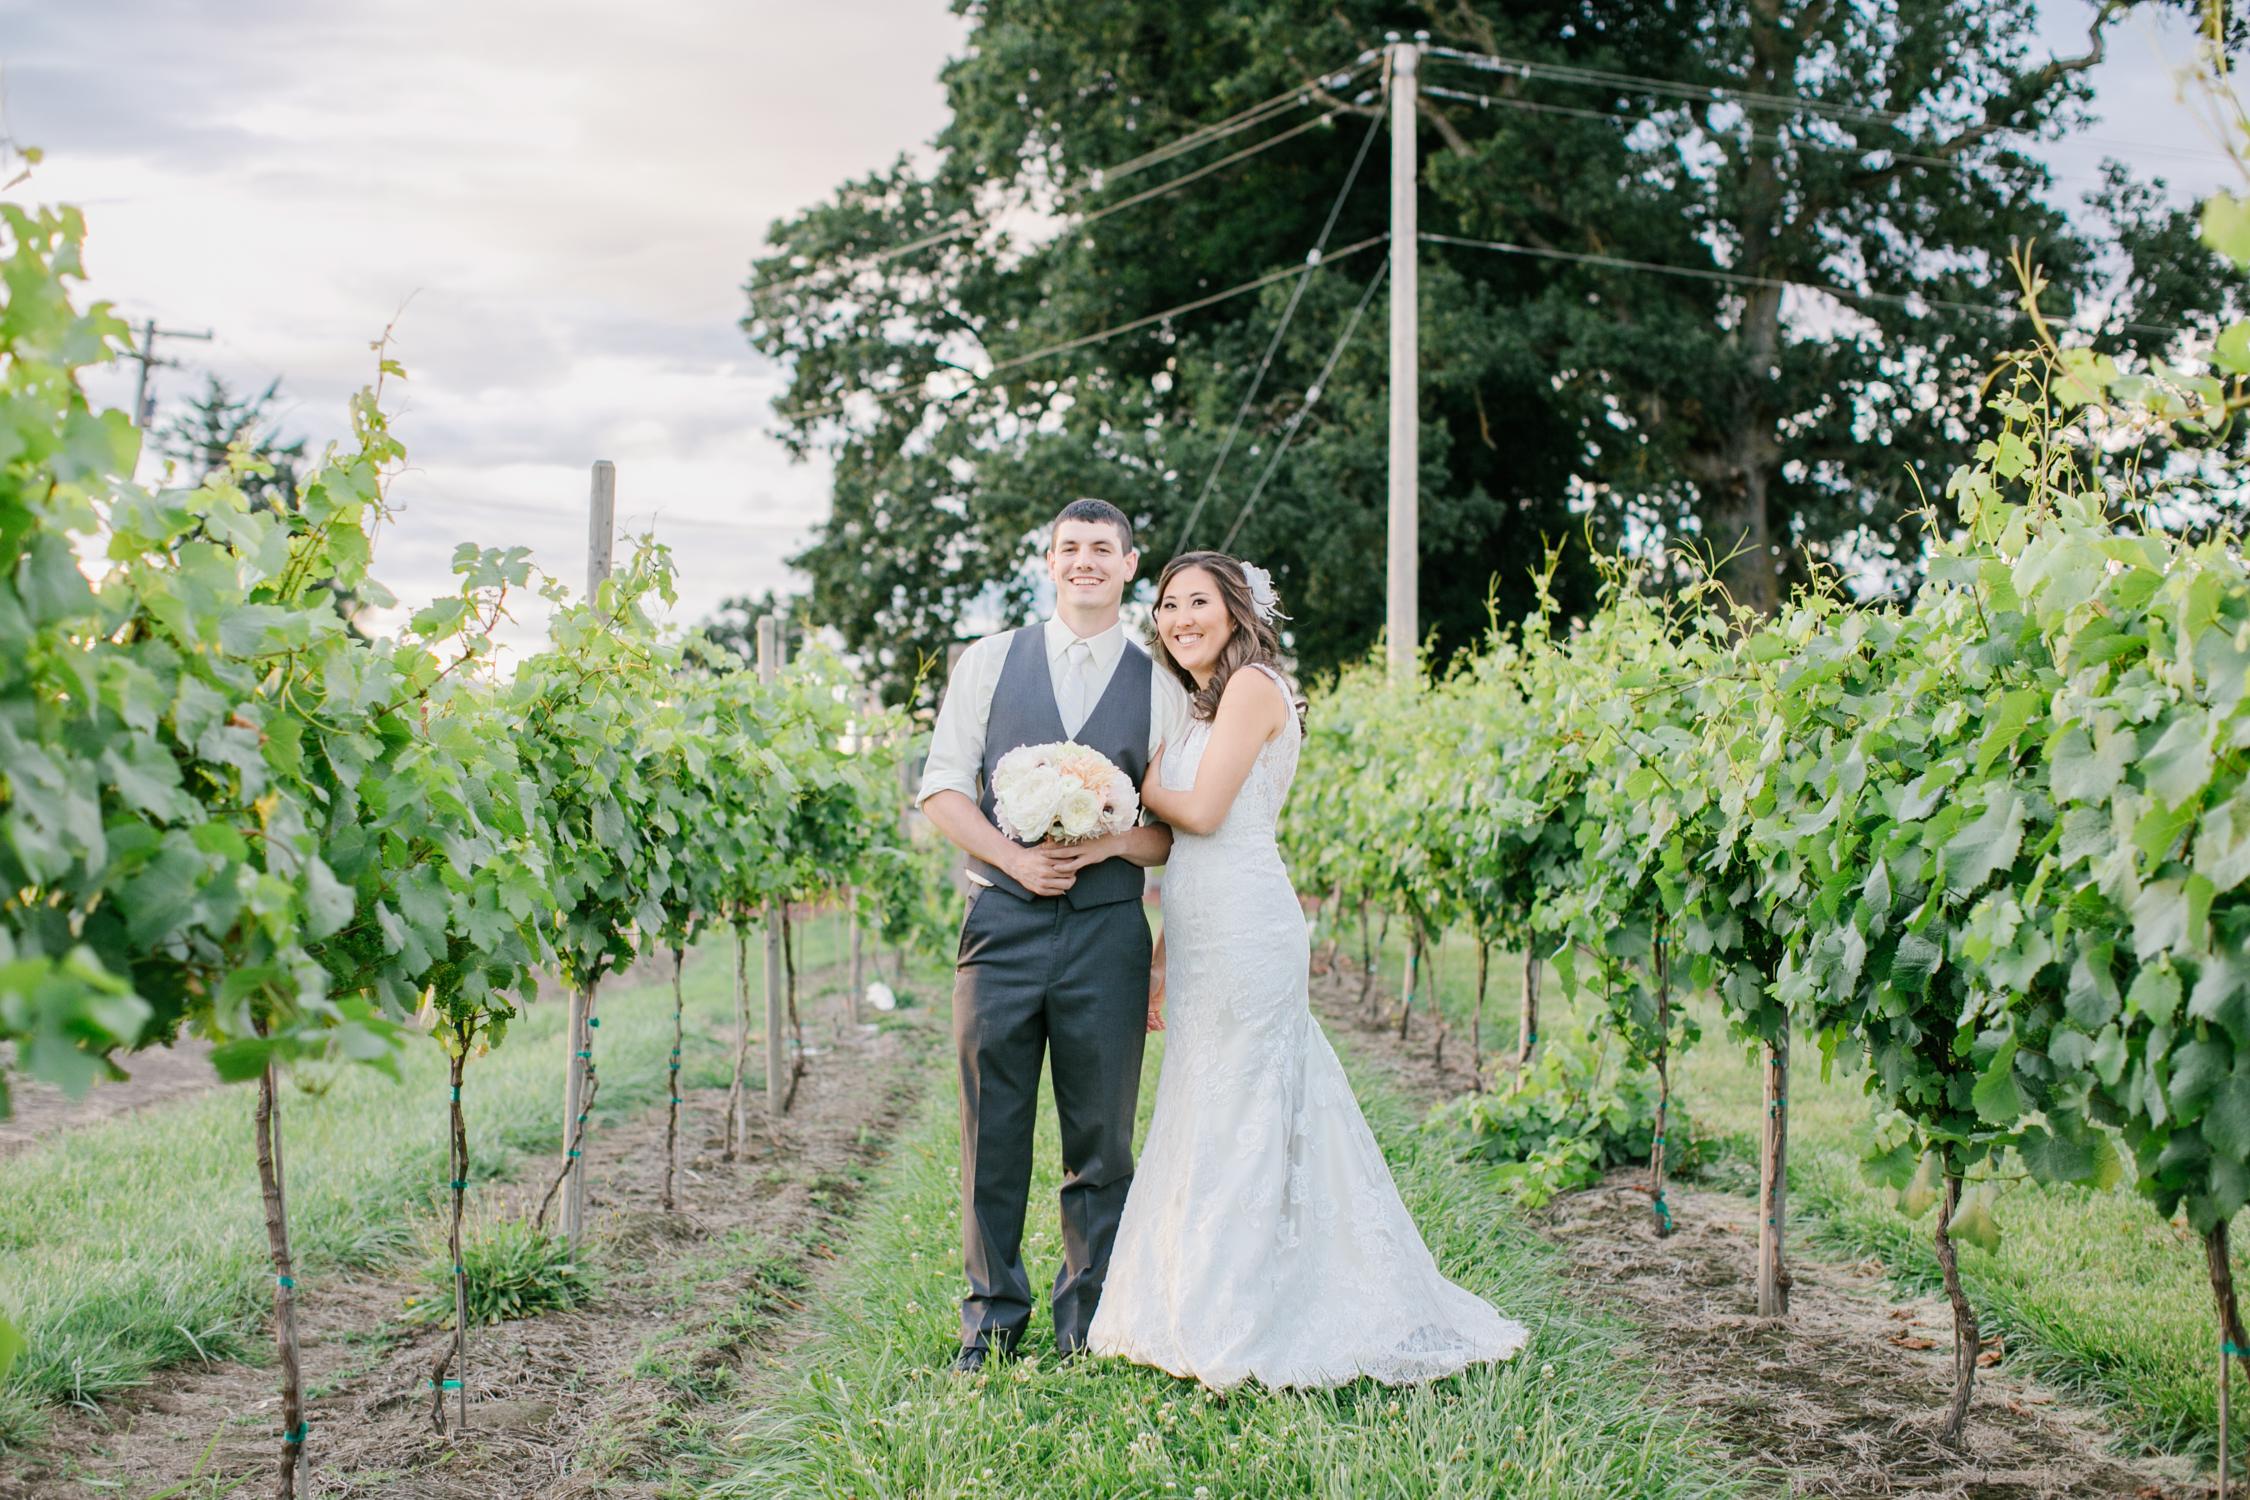 Postlewaits Oregon Wedding by Michelle Cross-51.jpg